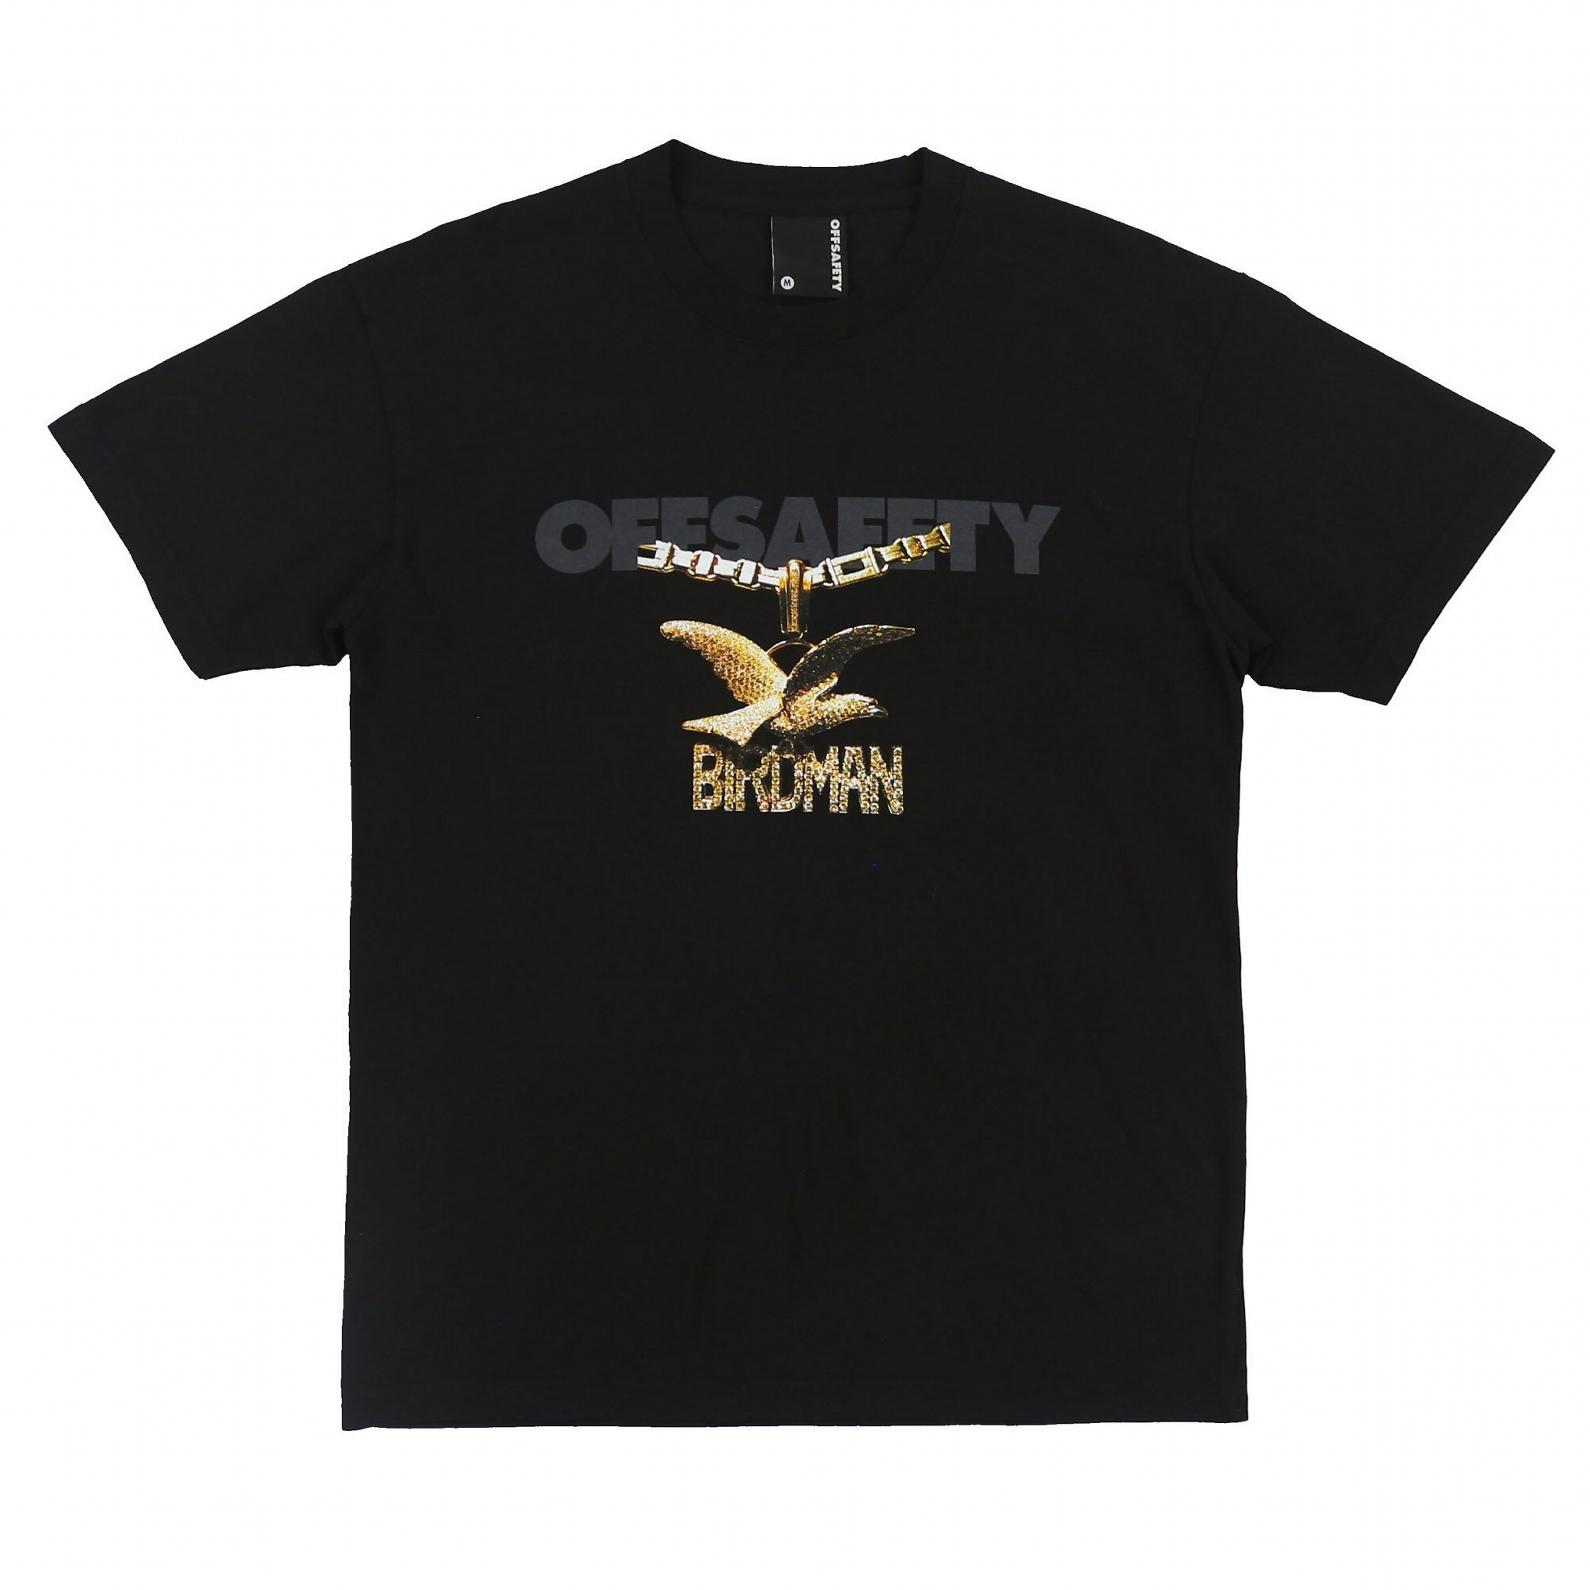 【OFF SAFETY/オフセーフティー】CHAIN GANG TEE Tシャツ / BLACK